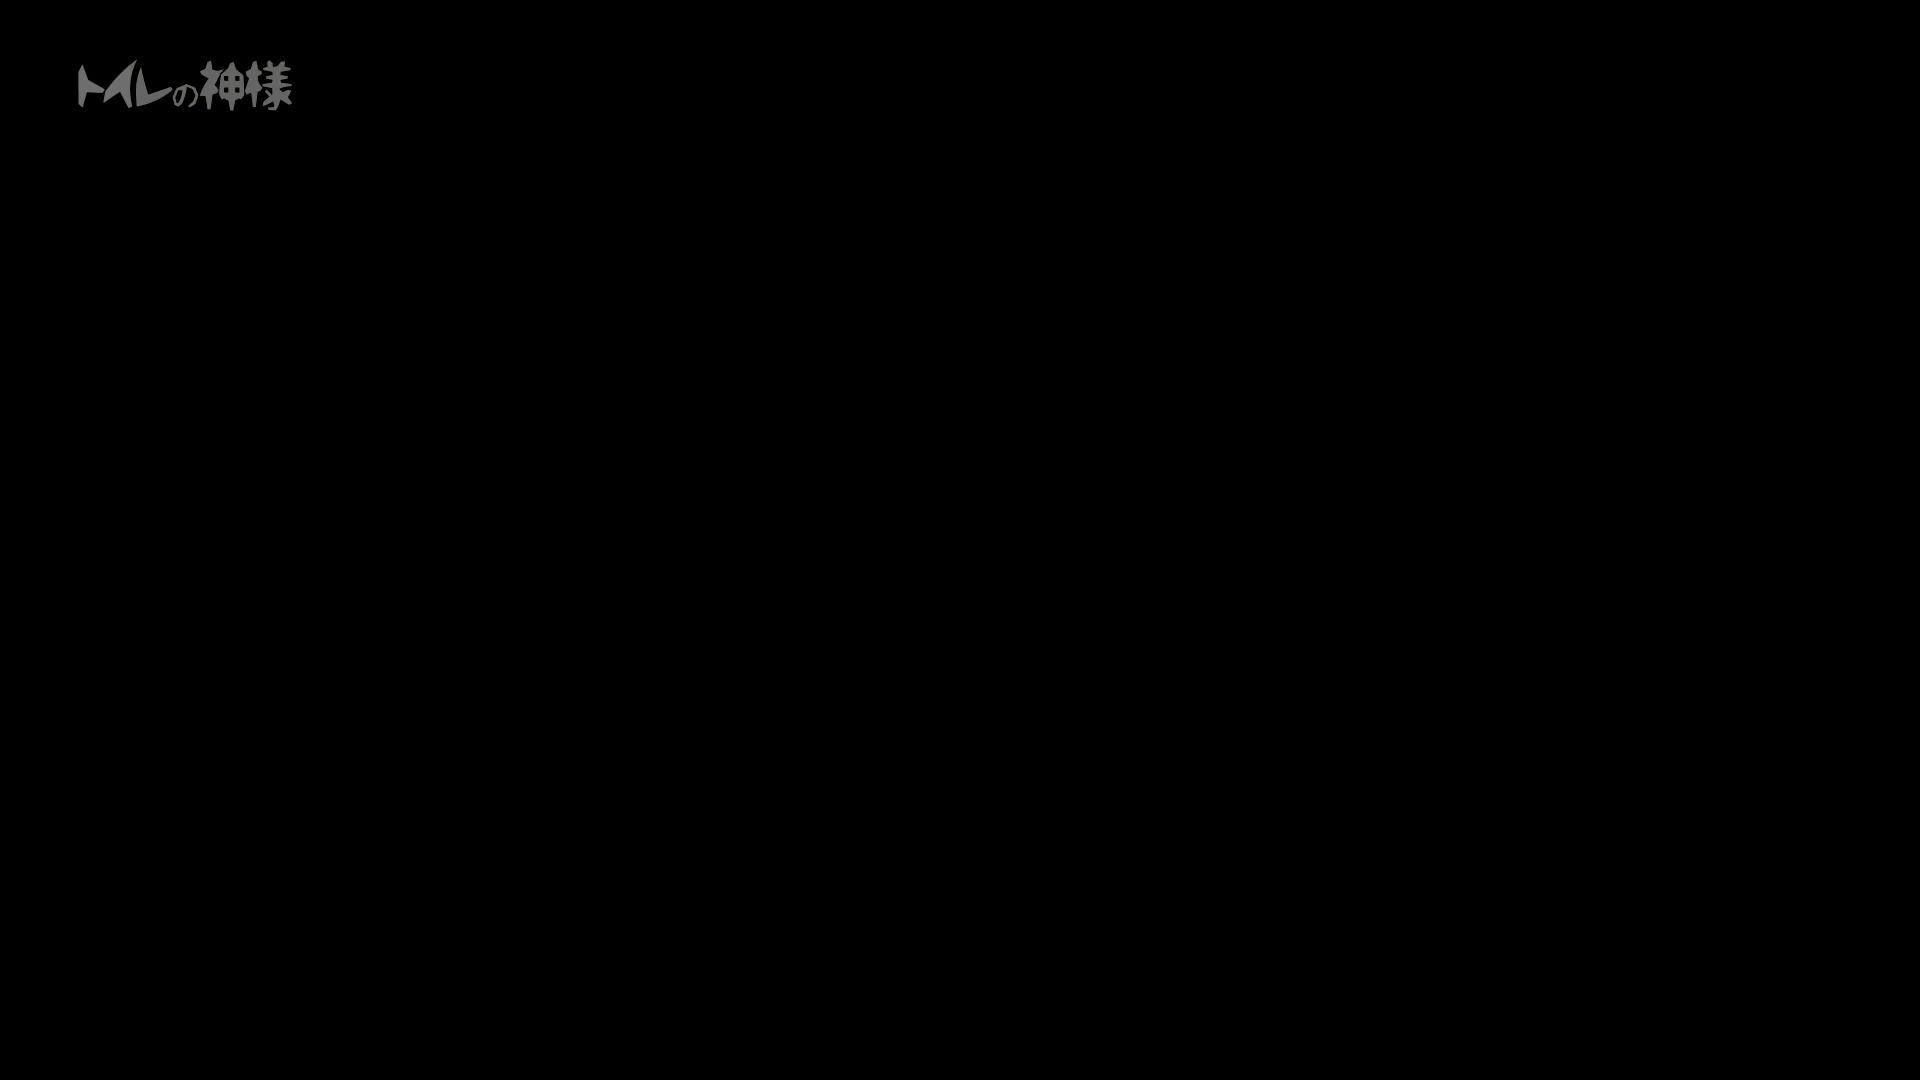 Vol.02 花の女子大生うんこ盗撮2 OL女体 ワレメ無修正動画無料 97連発 17